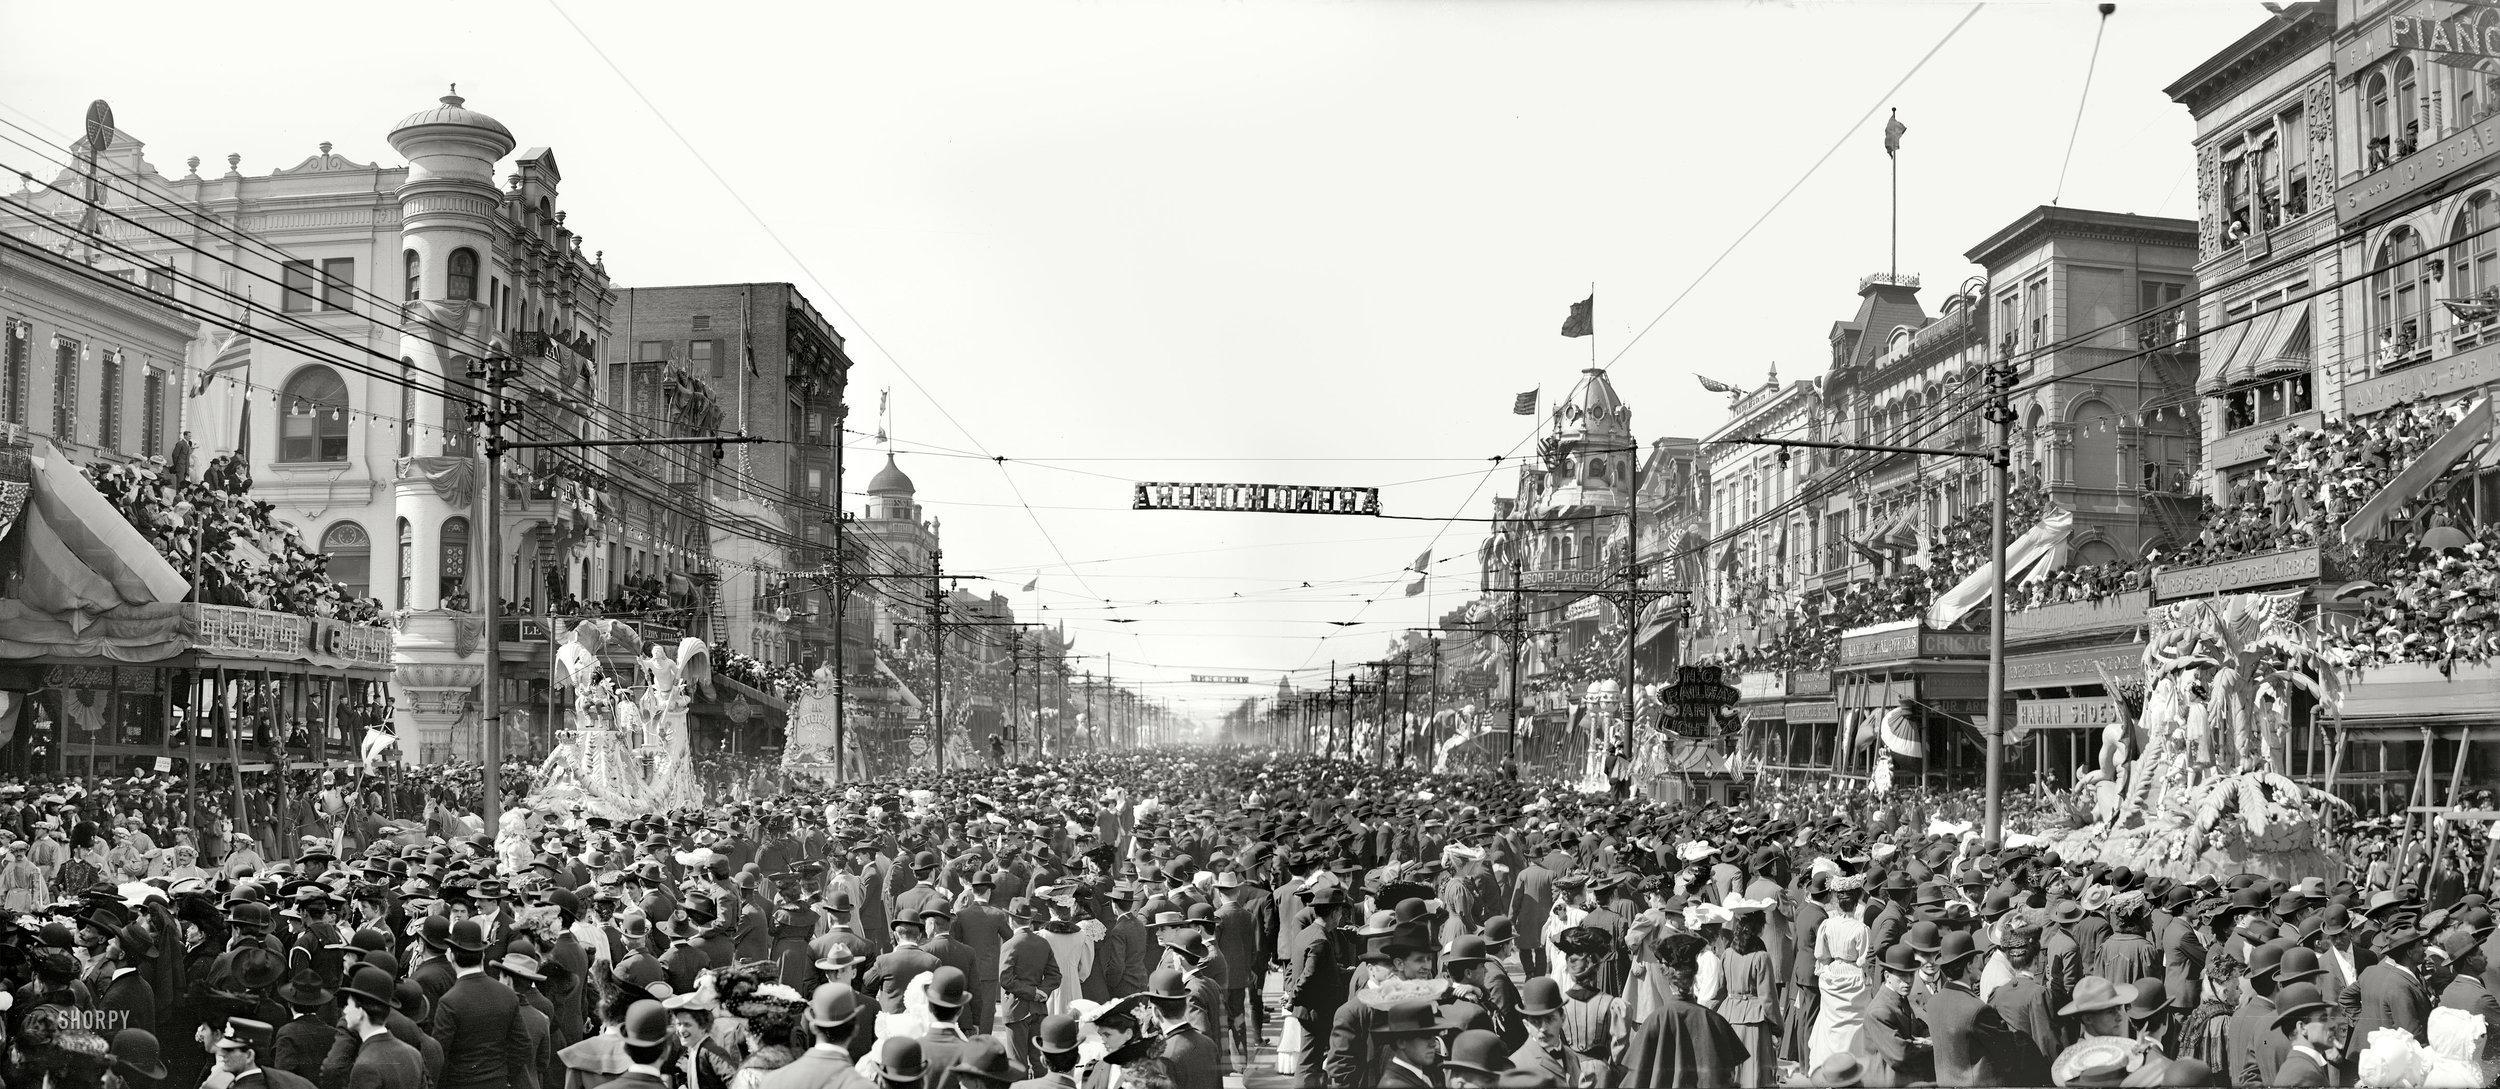 Mardi Gras: New Orleans 1907